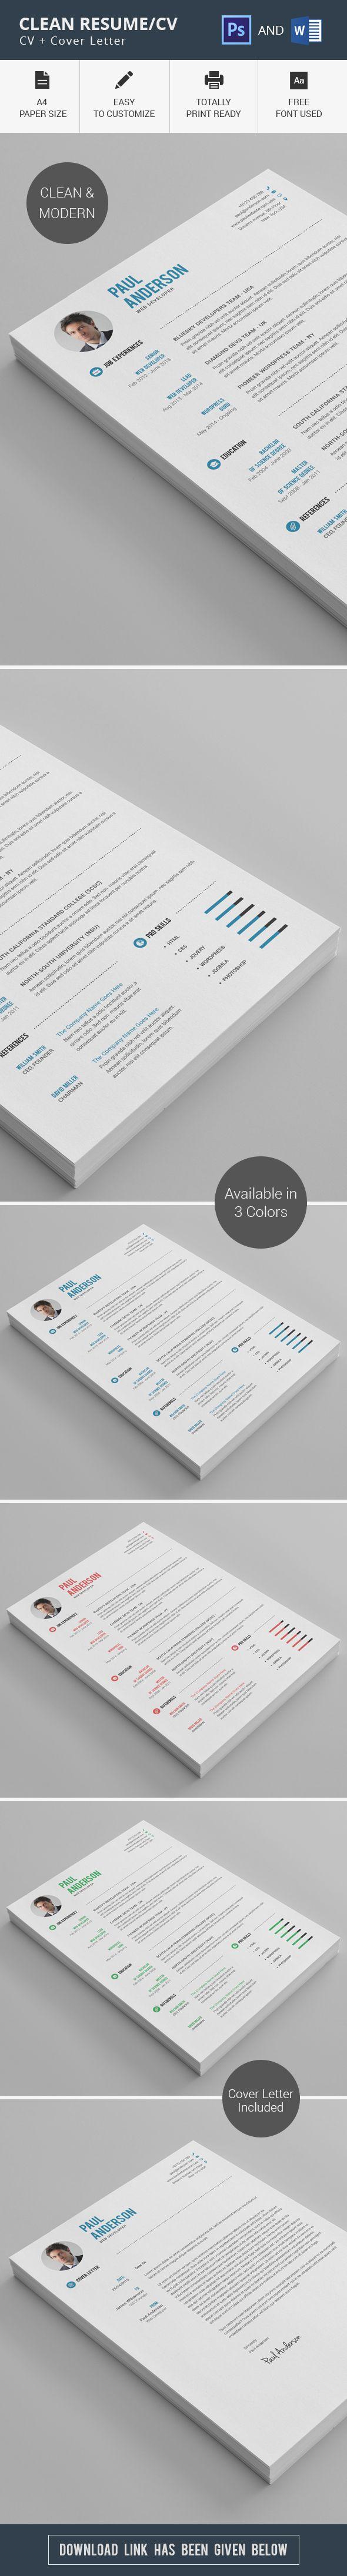 margins for resume%0A Clean Resume CV on Behance